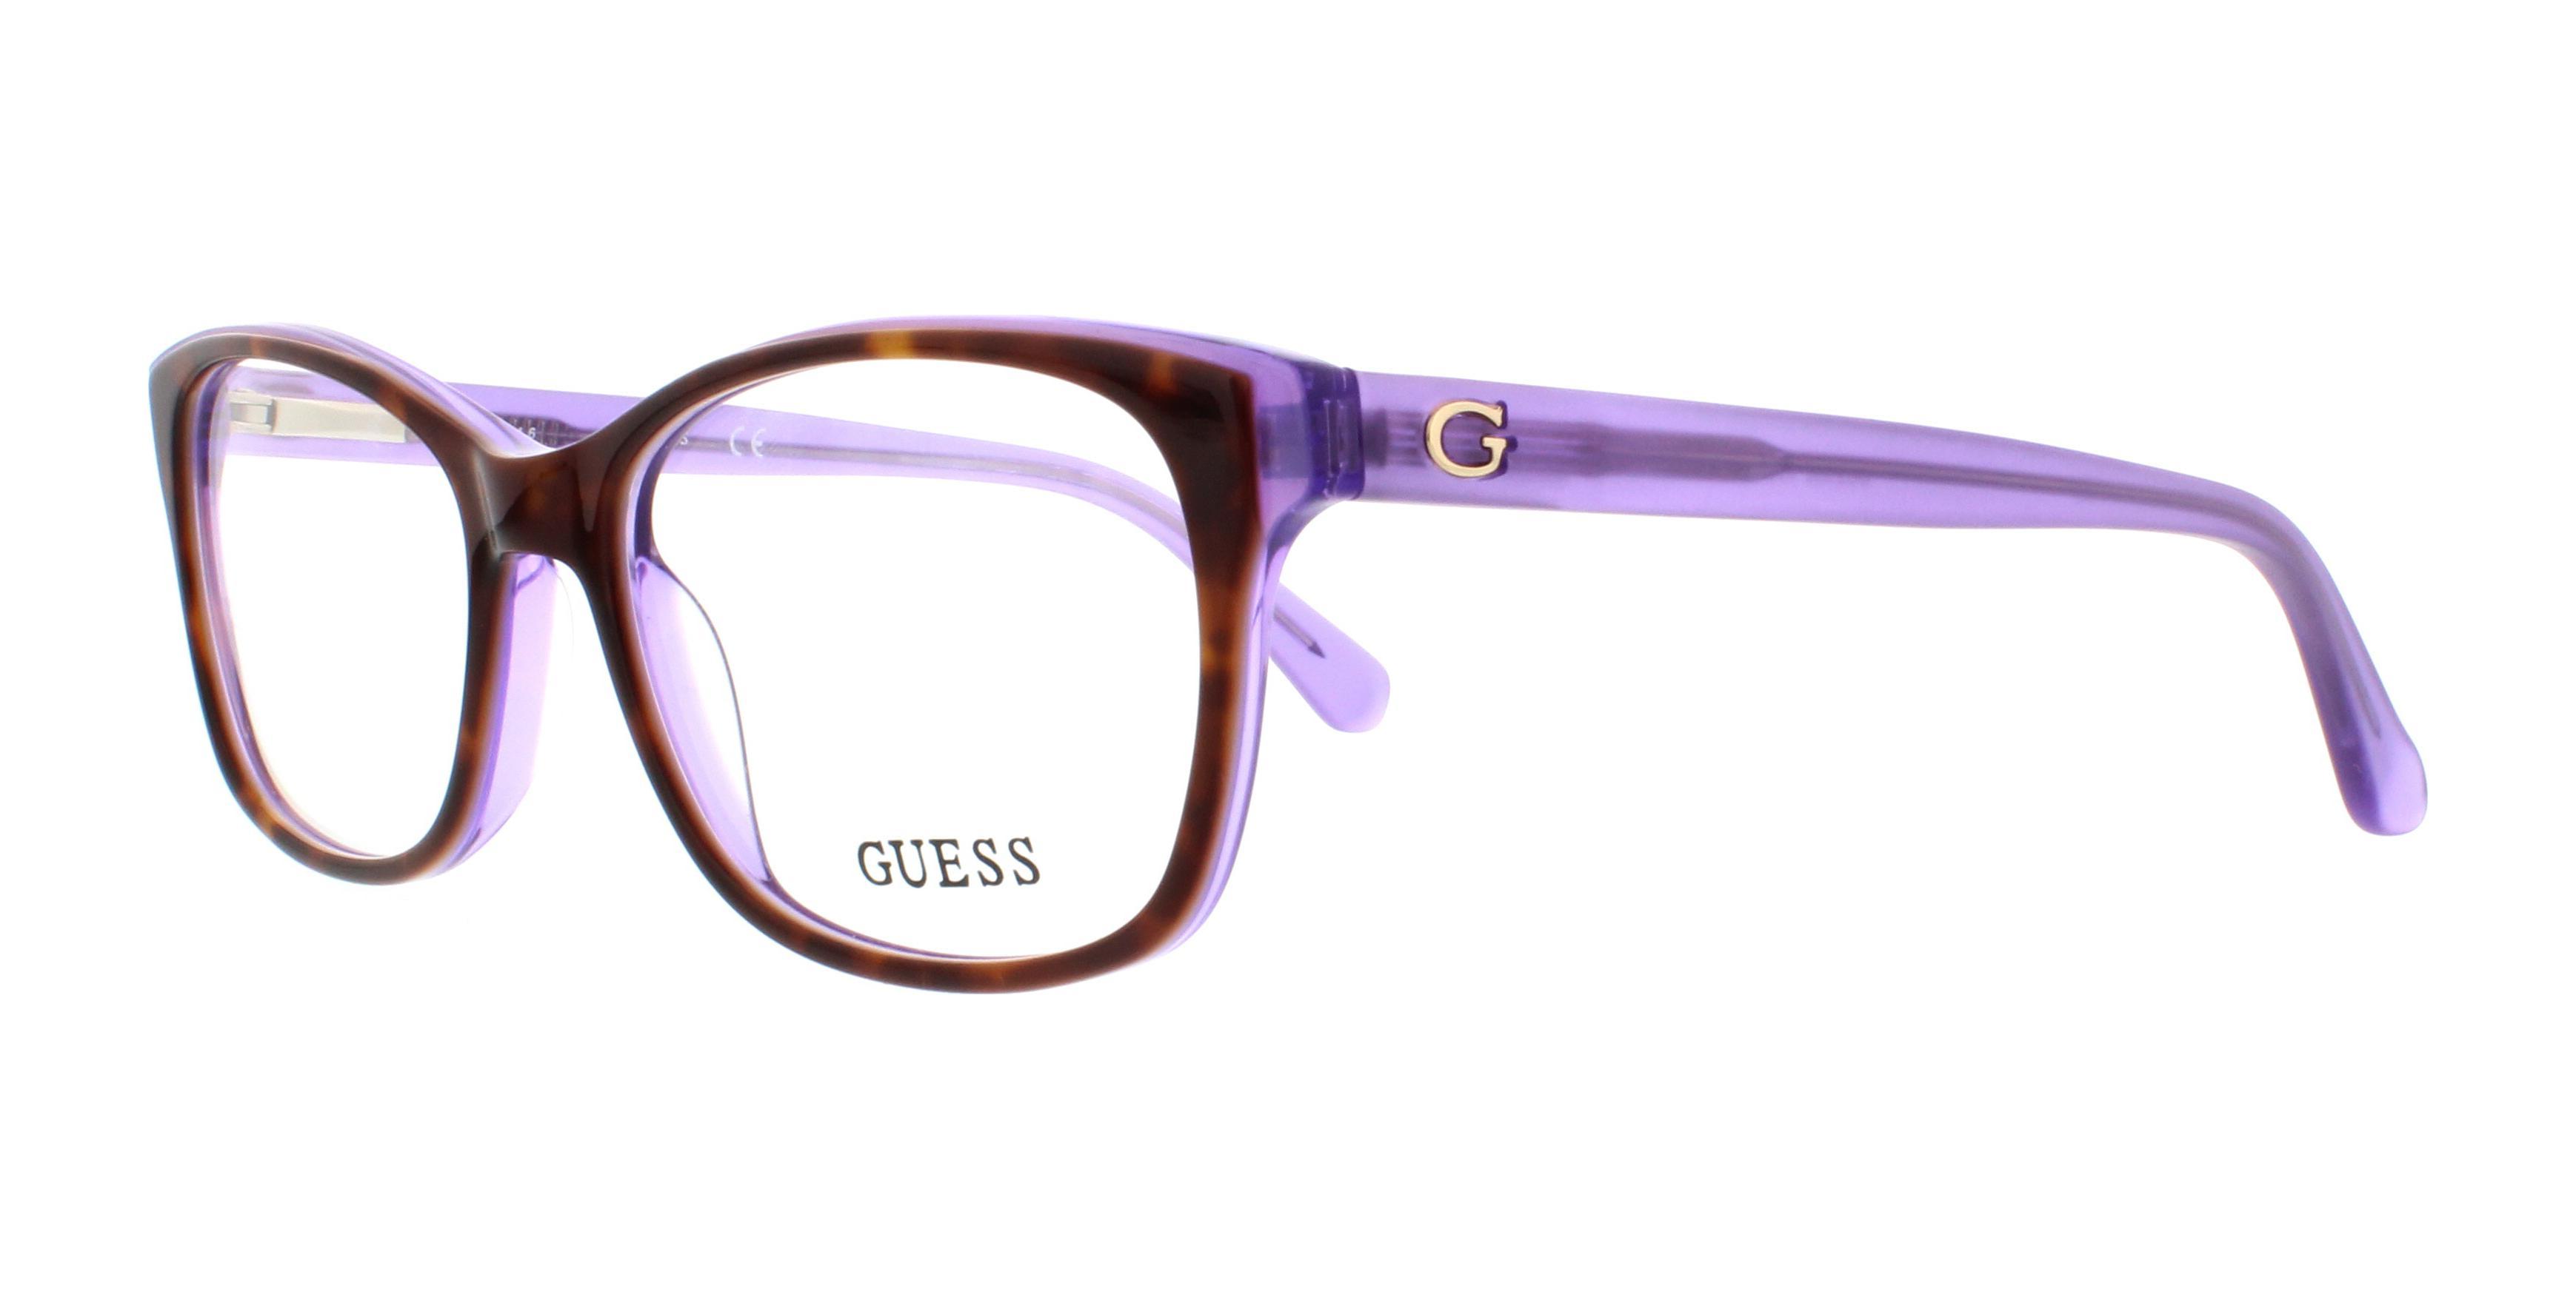 5565895e507 Designer Frames Outlet. Guess GU2582